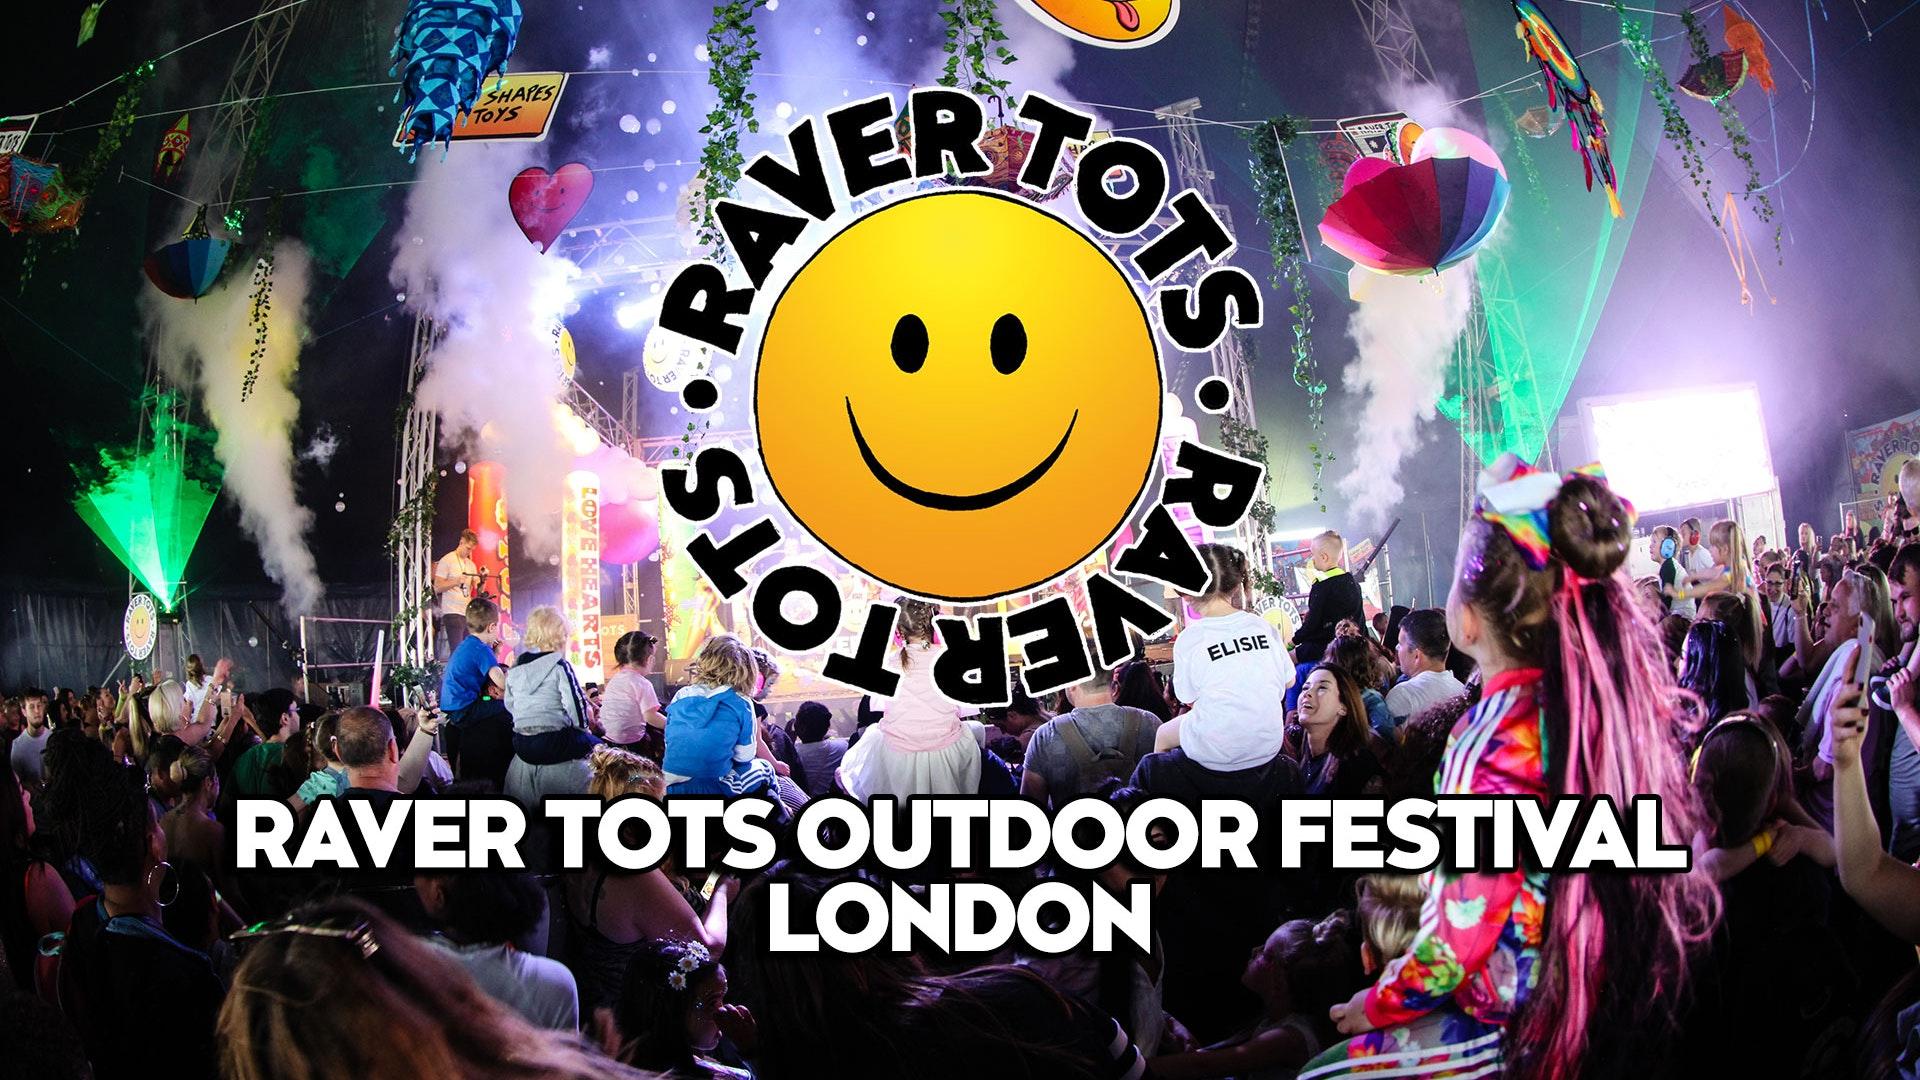 Raver Tots Outdoor Festival London 2021